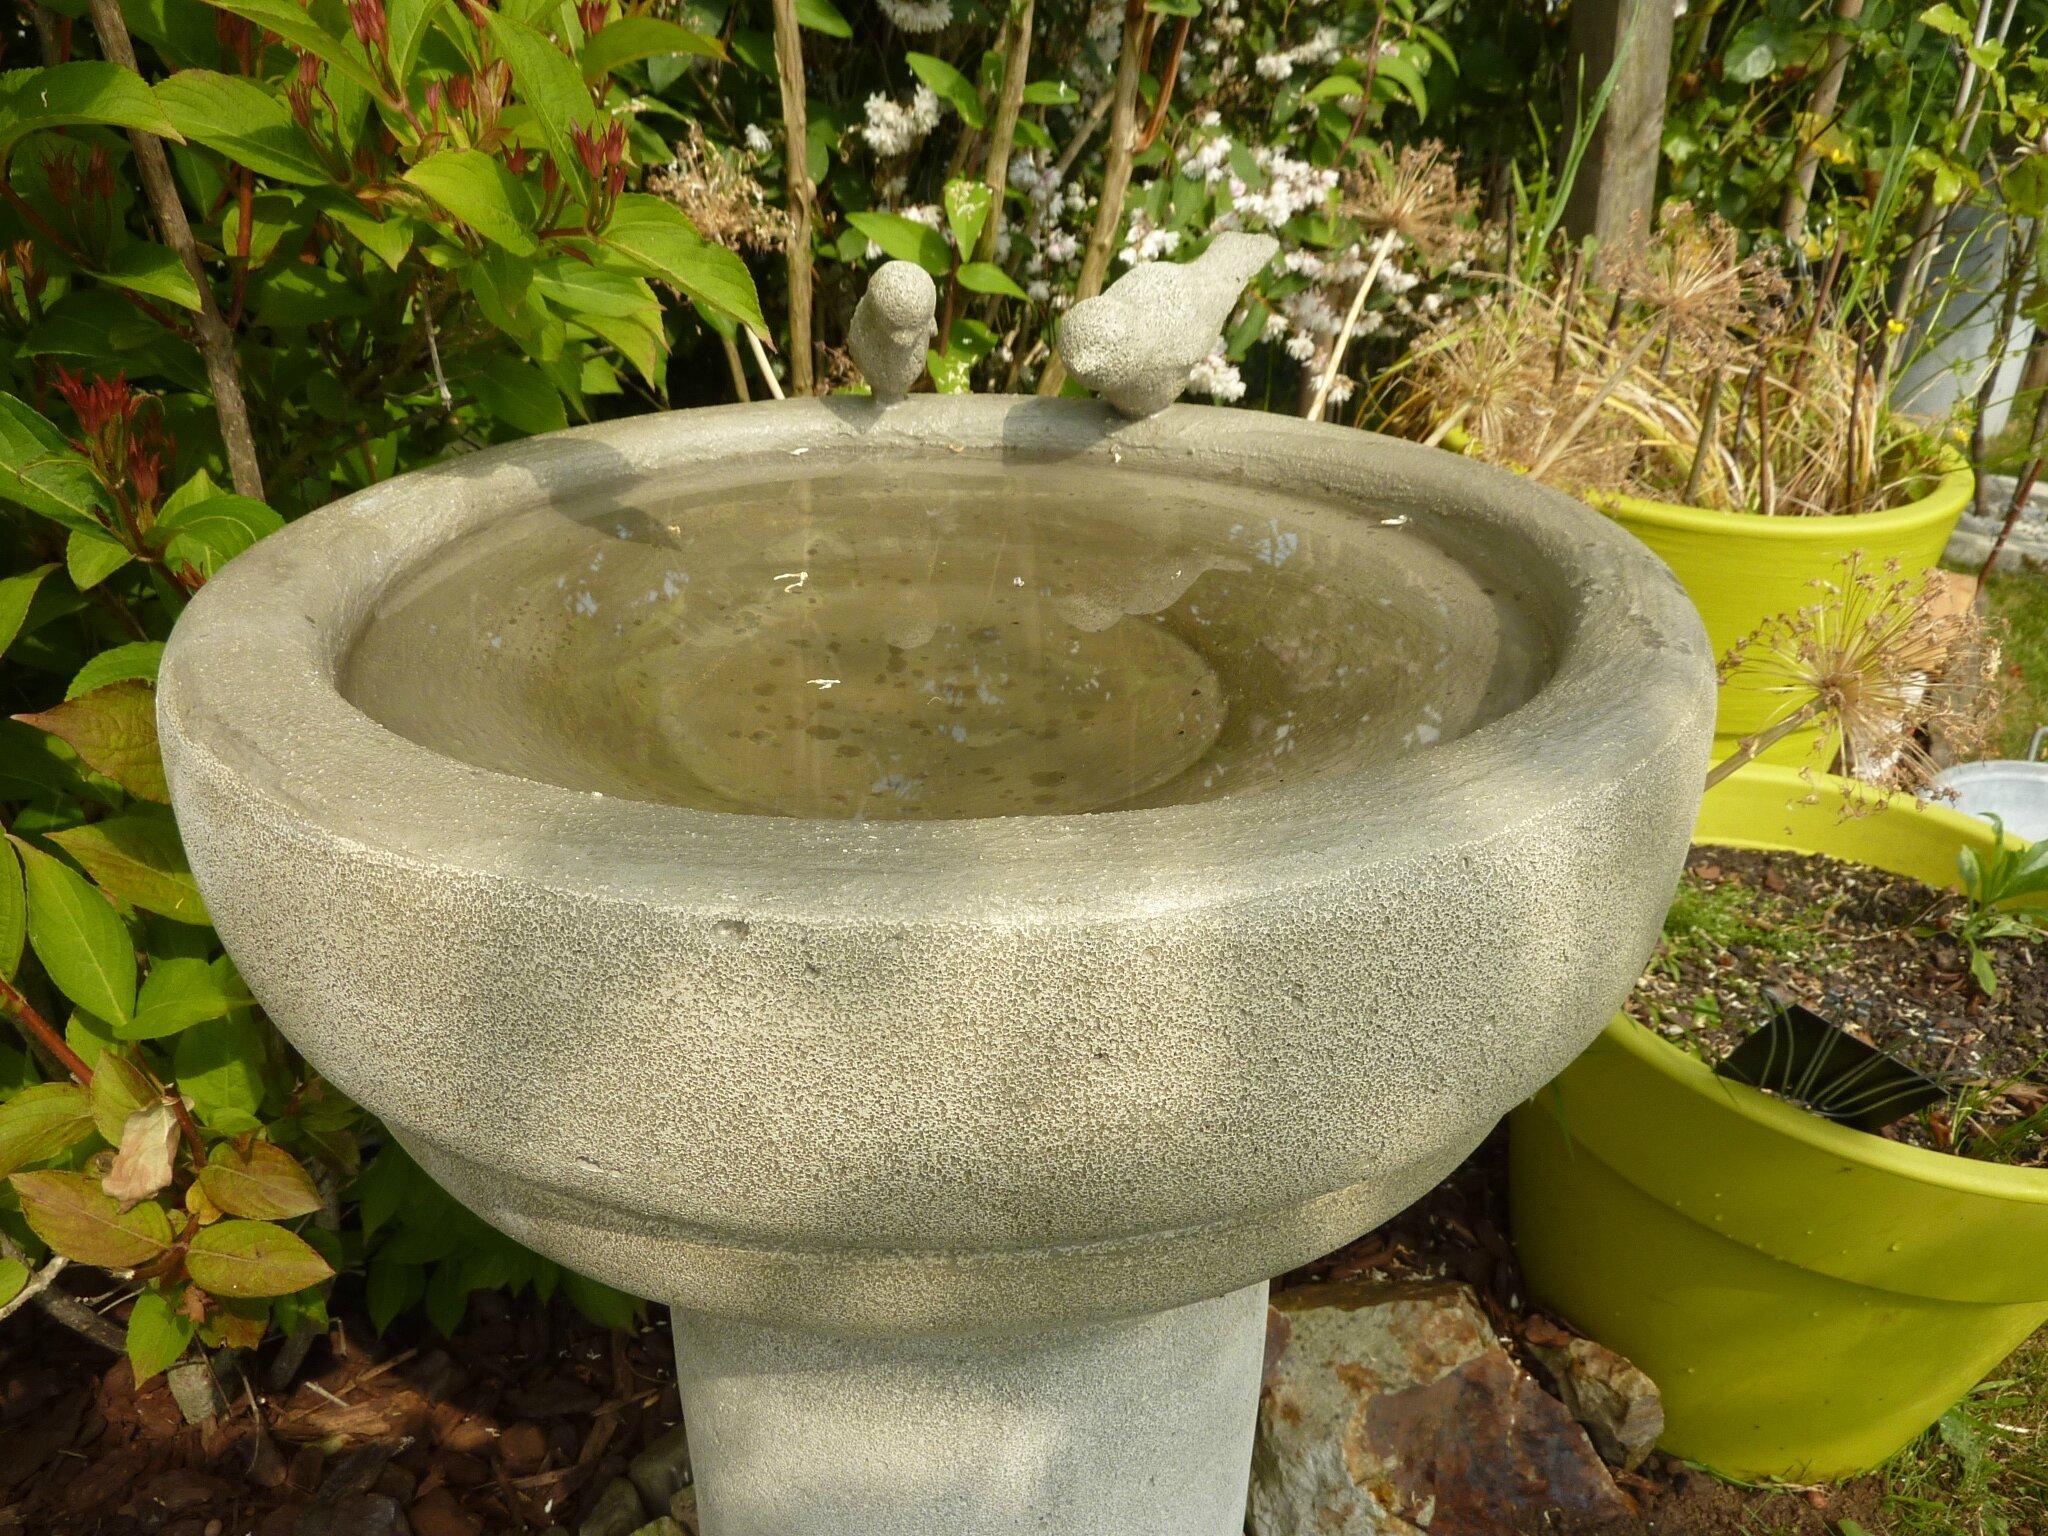 Bassin plastique for Bassin de jardin en plastique